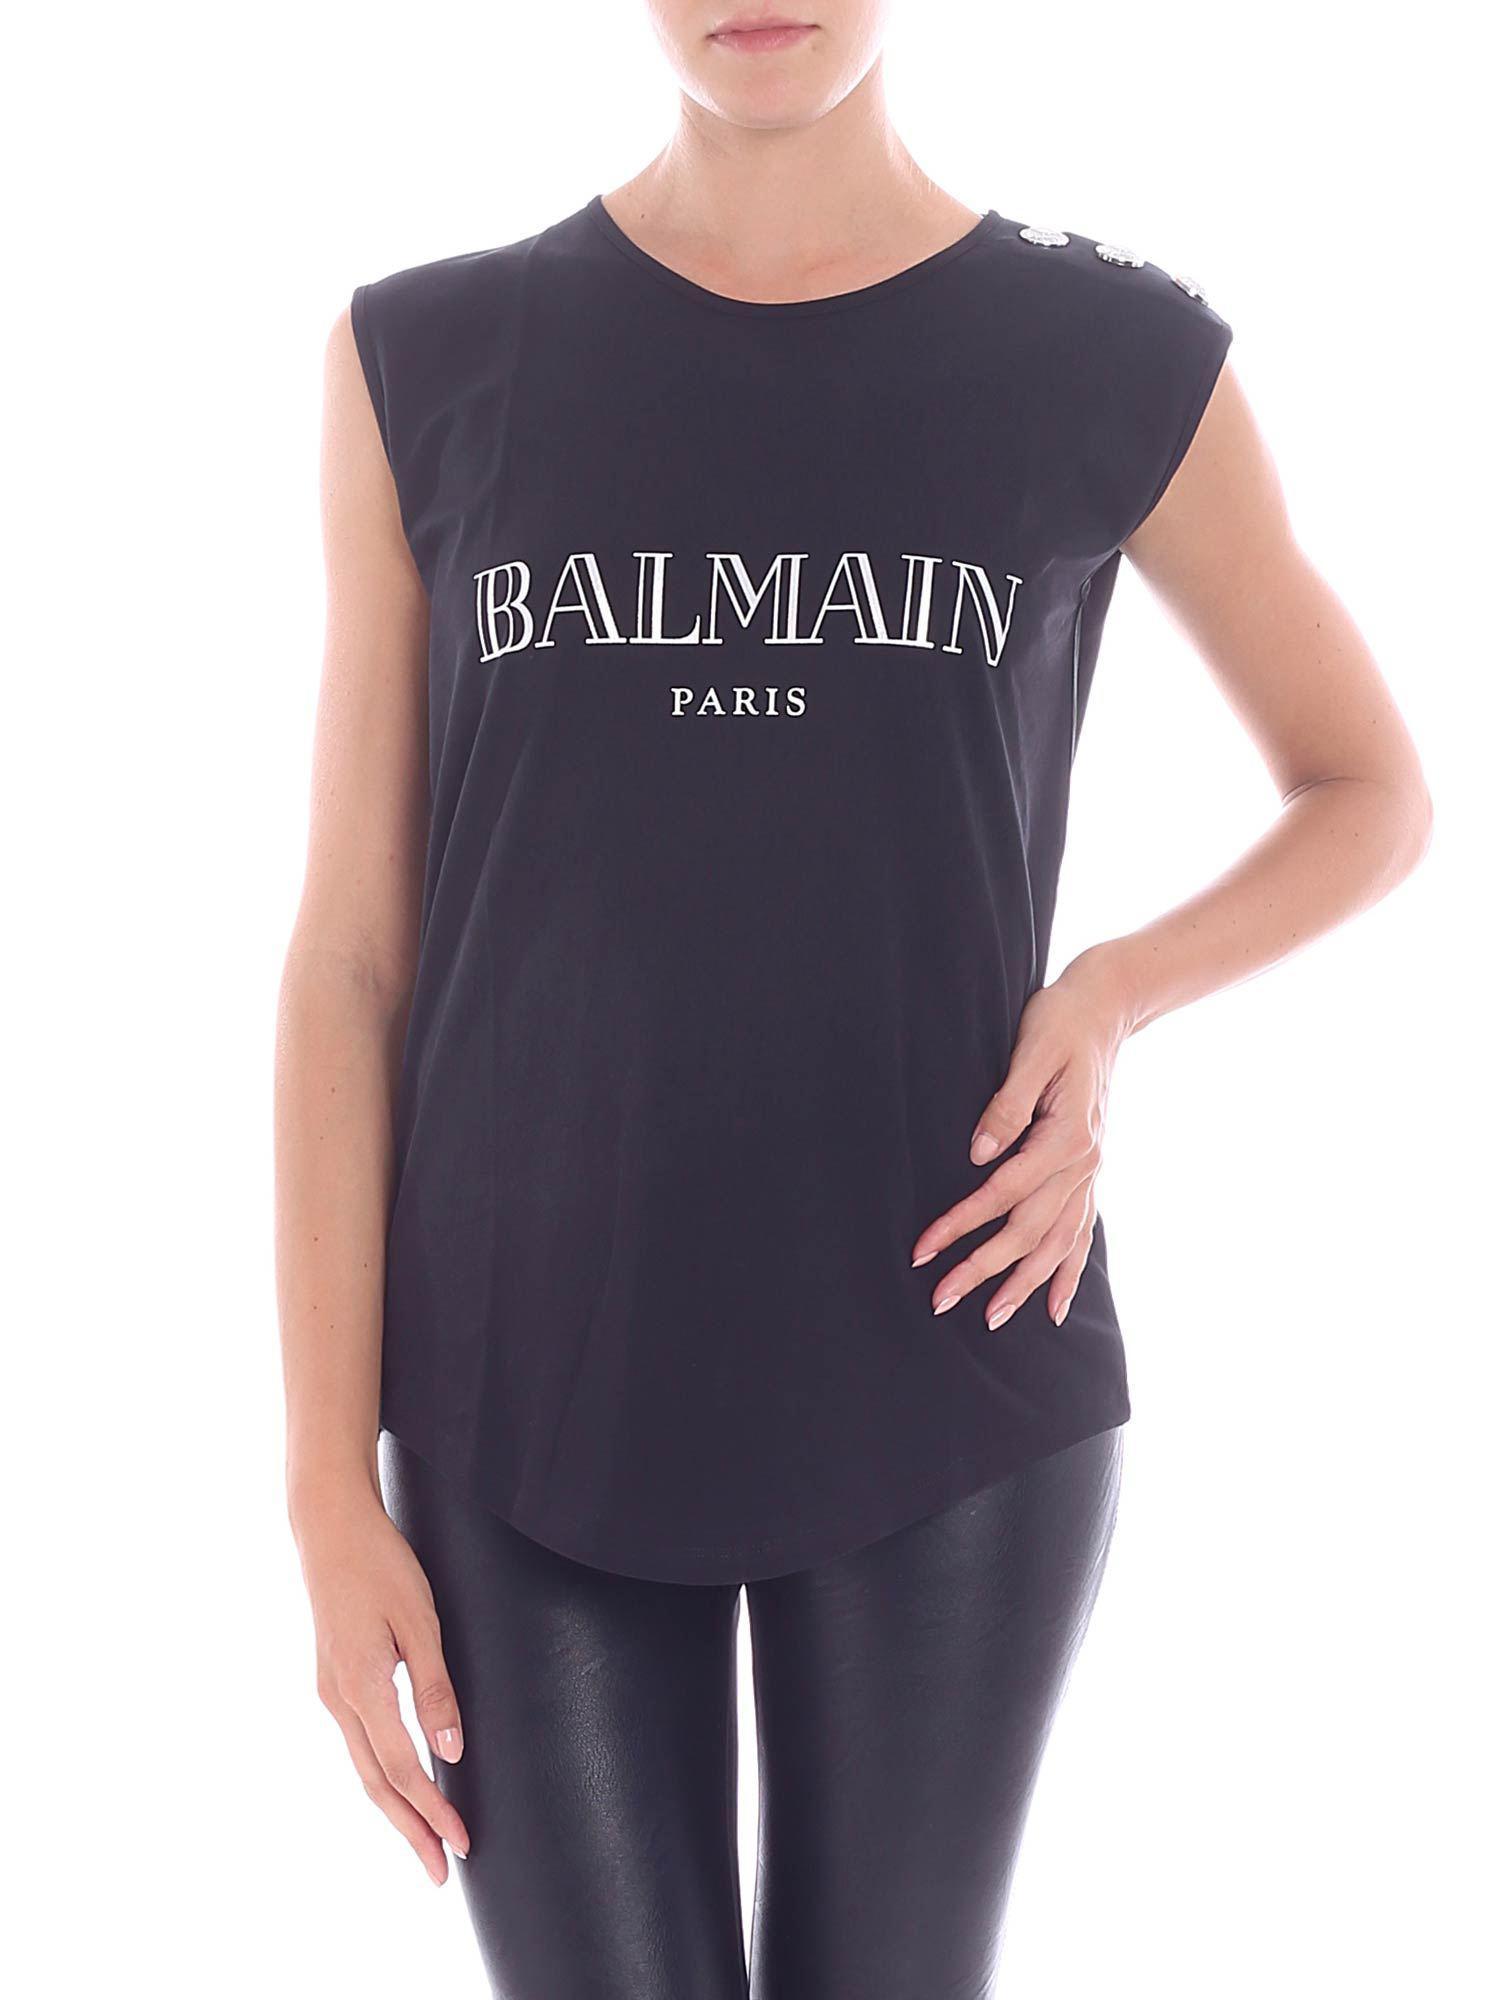 9698cf7be5dec0 Balmain - Black Top With Silver Iridescent Logo Print - Lyst. View  fullscreen